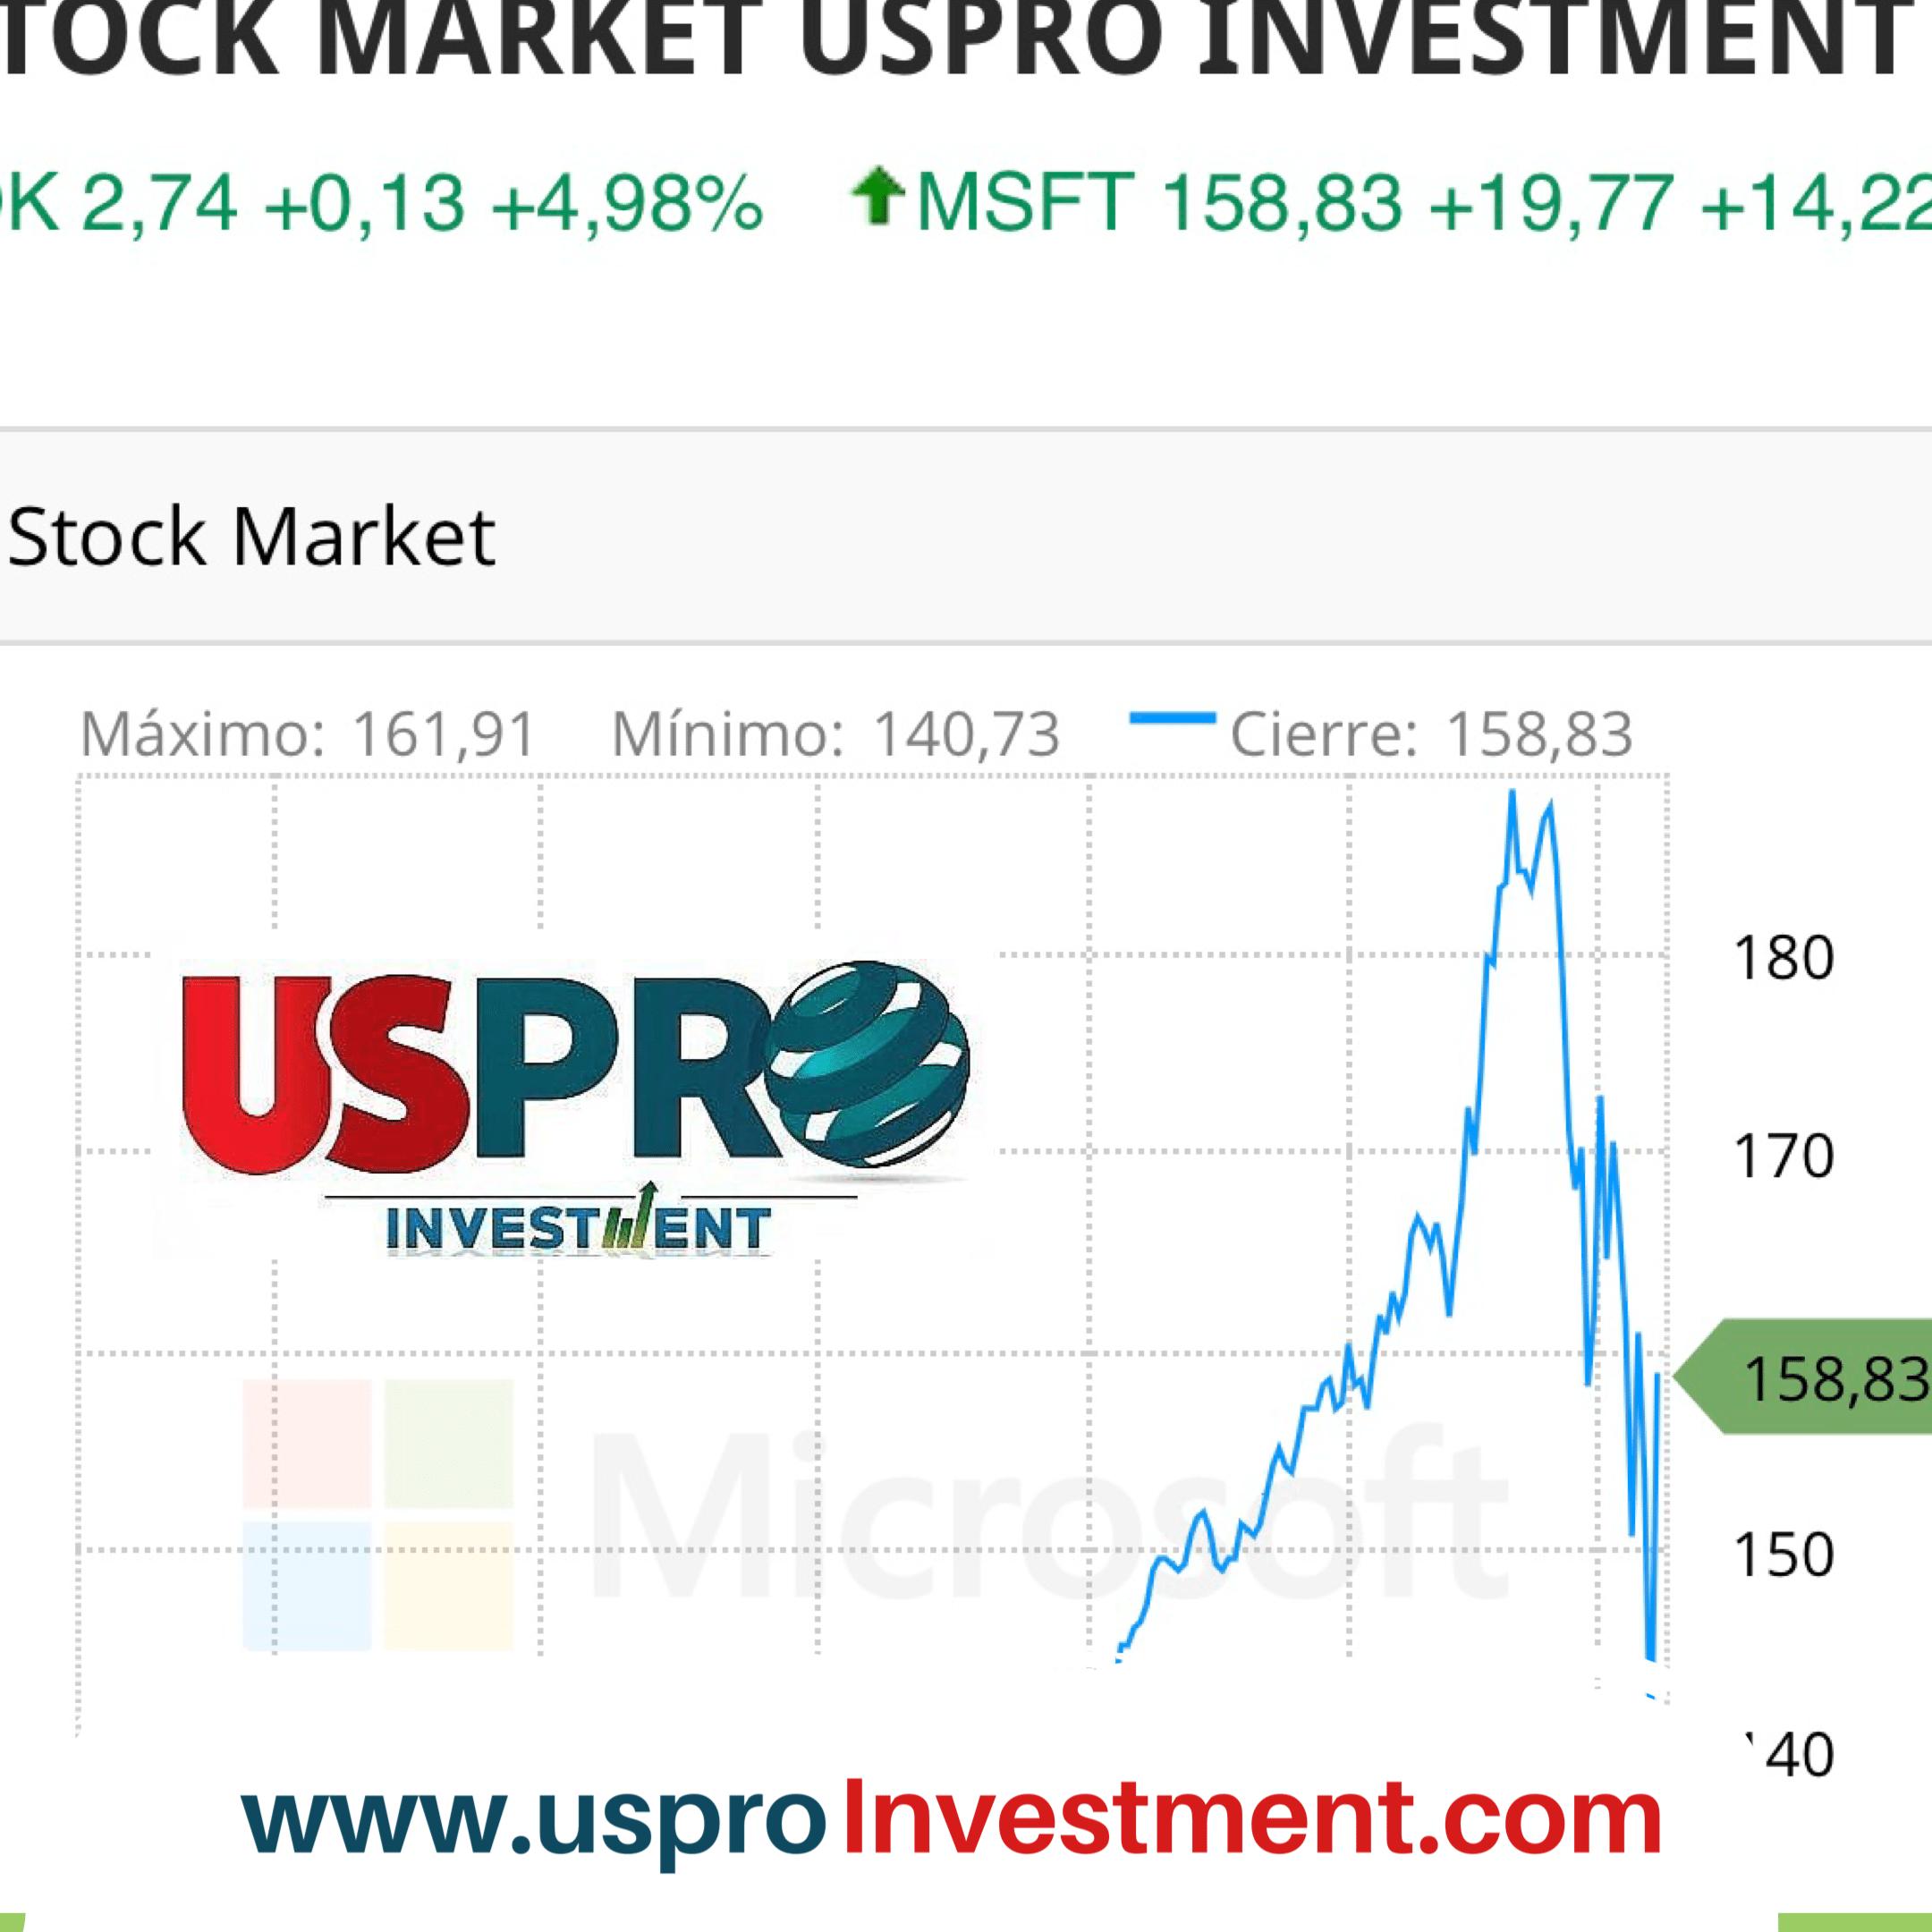 Tercera jornada en negativo del Stock Market: aprovecha estaoportunidad